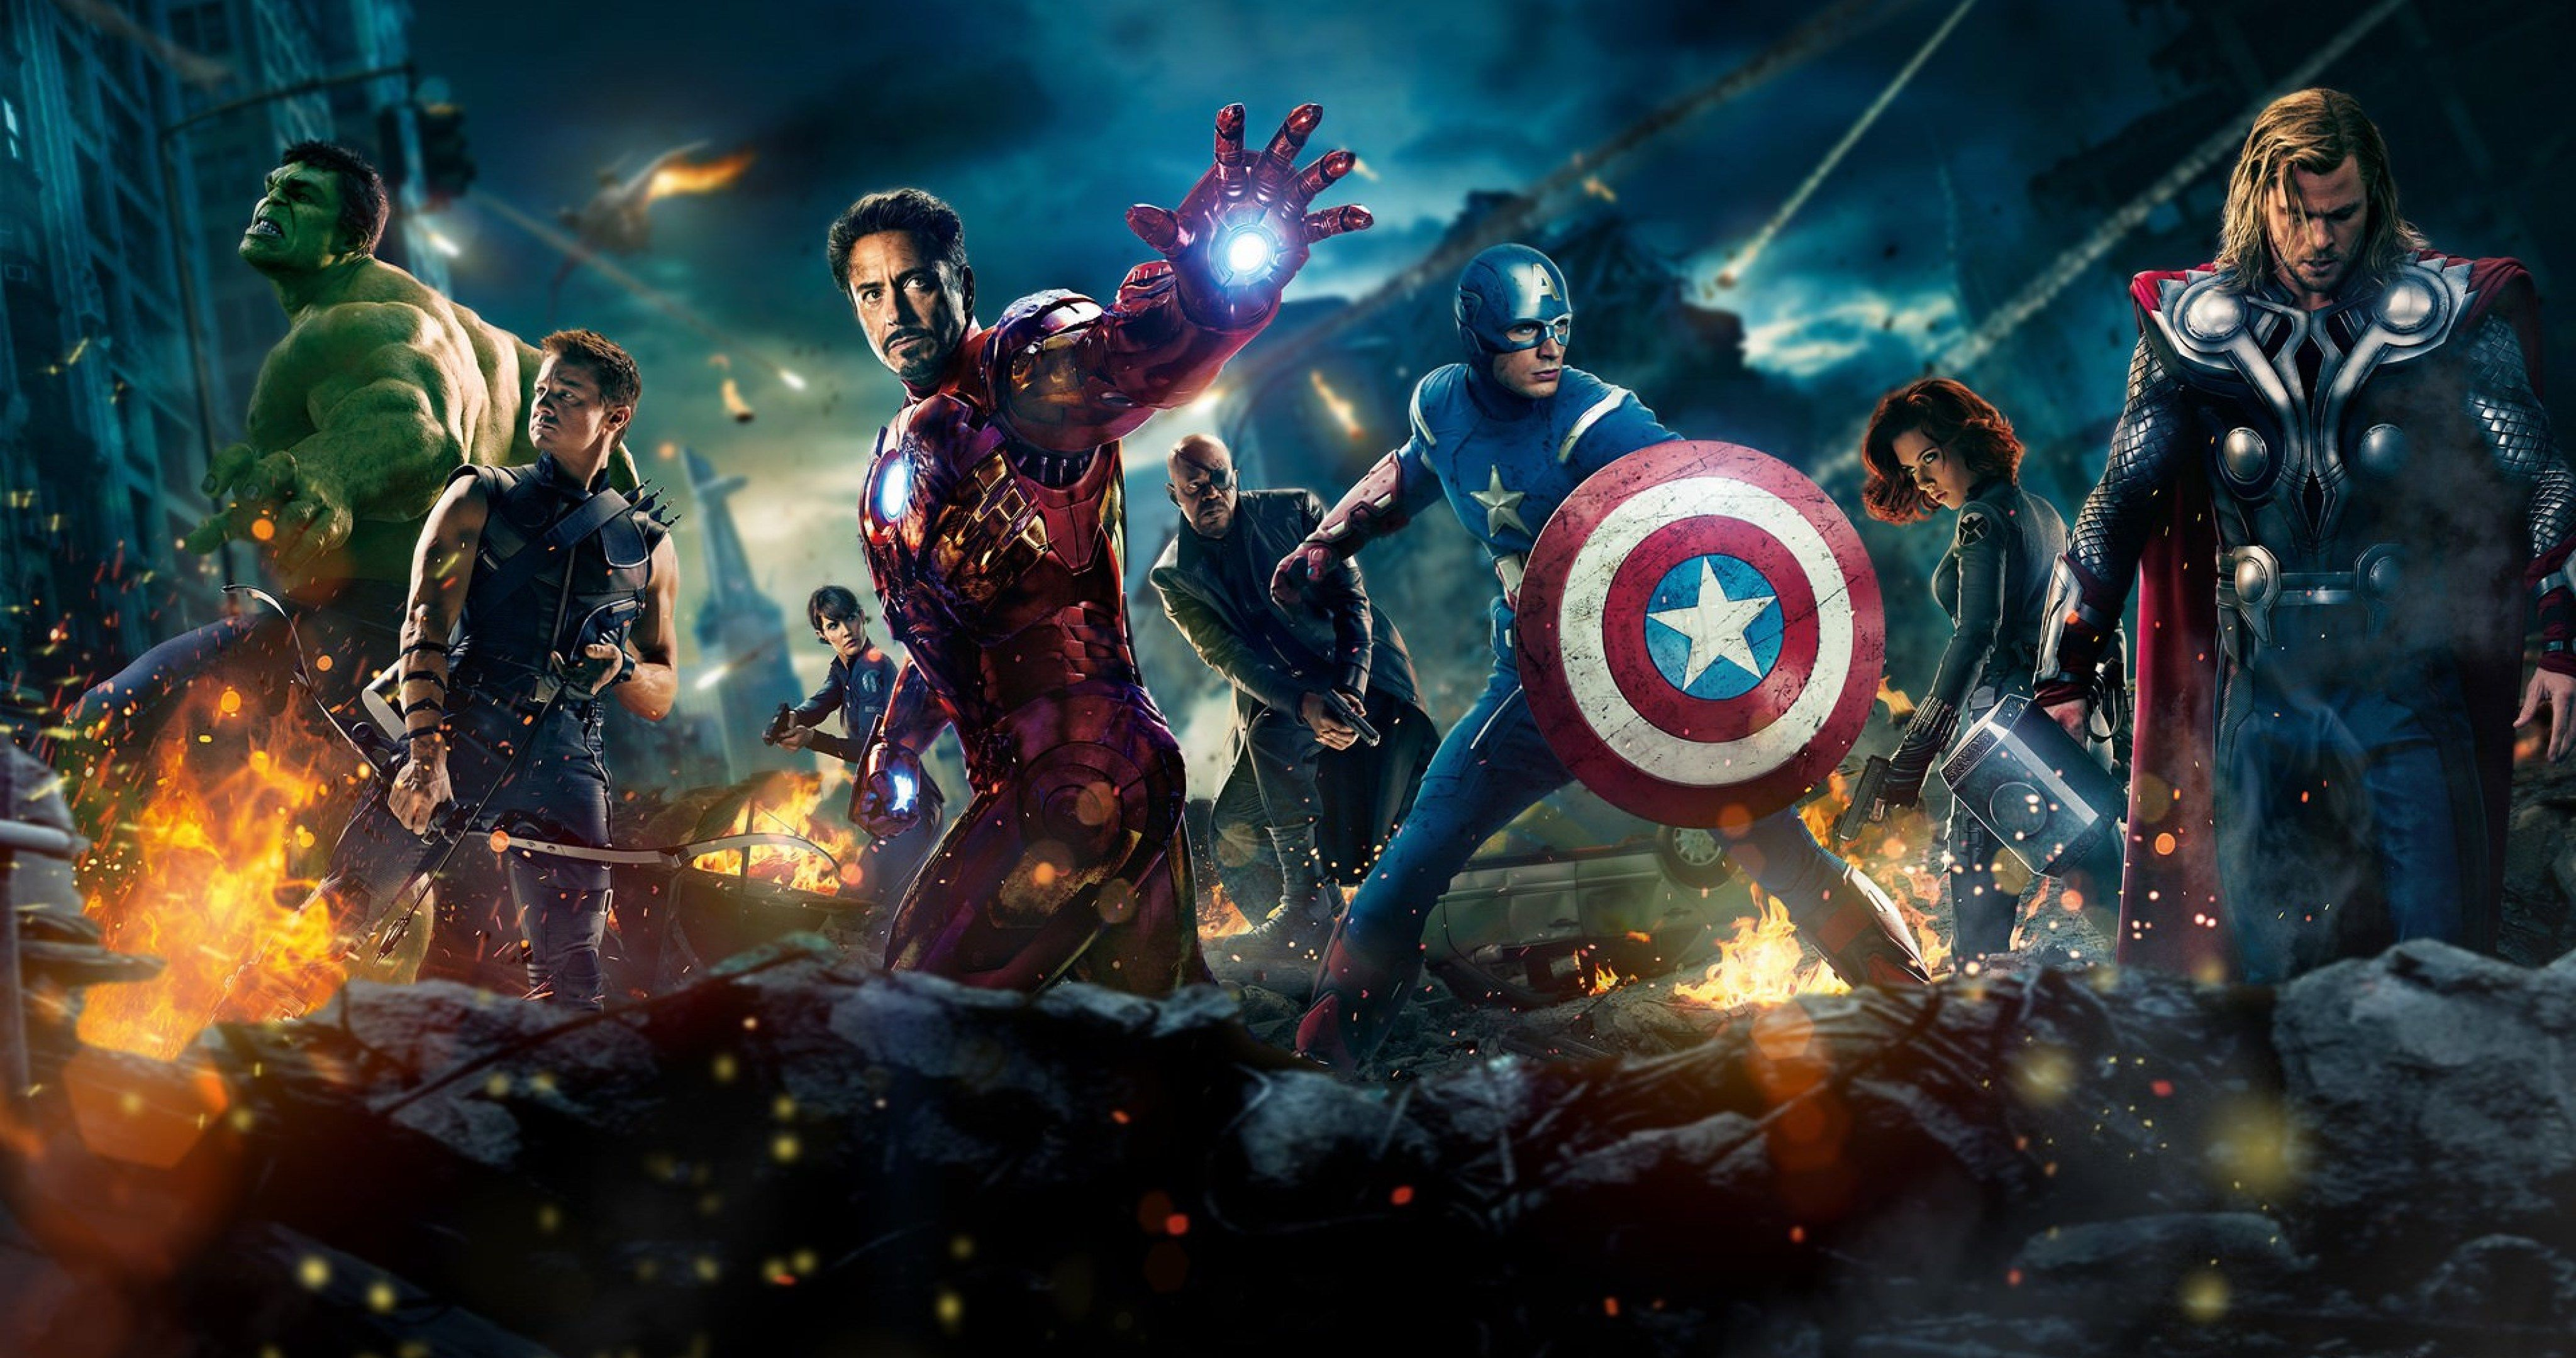 The Avengers Movie 2012 4k Ultra Hd Wallpaper Marvel Cinematic